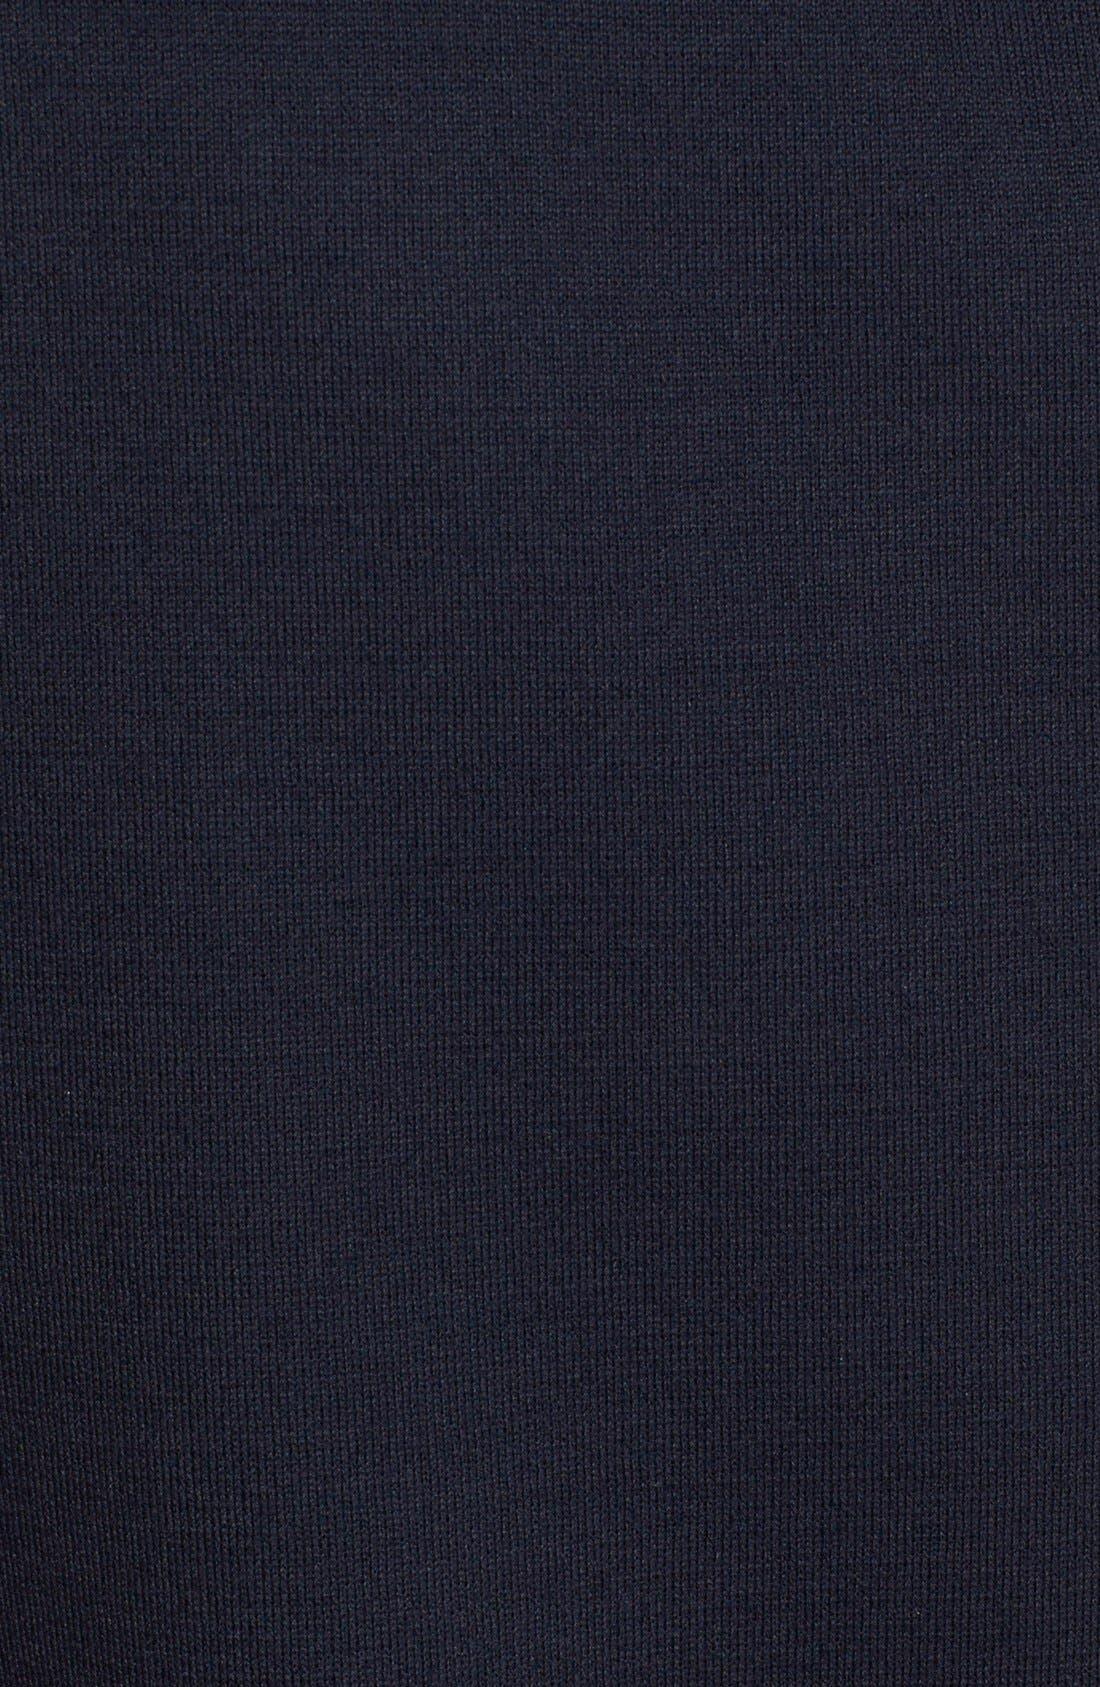 Milano Knit Contour Tank,                             Alternate thumbnail 6, color,                             NAVY